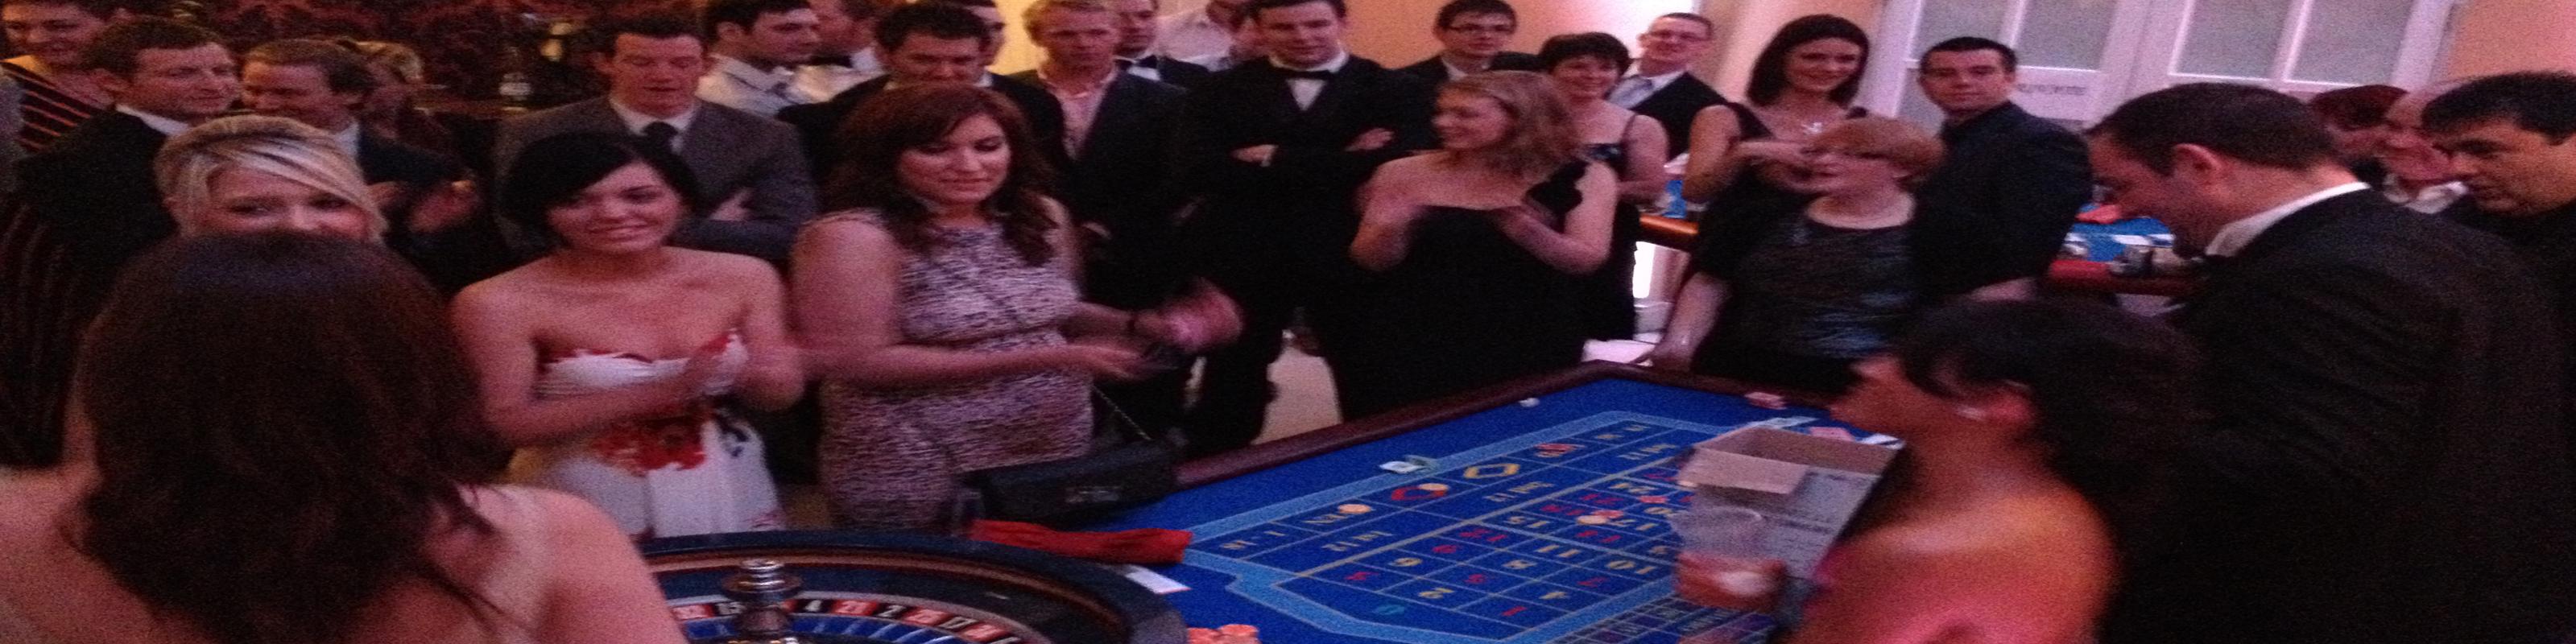 casino night ireland